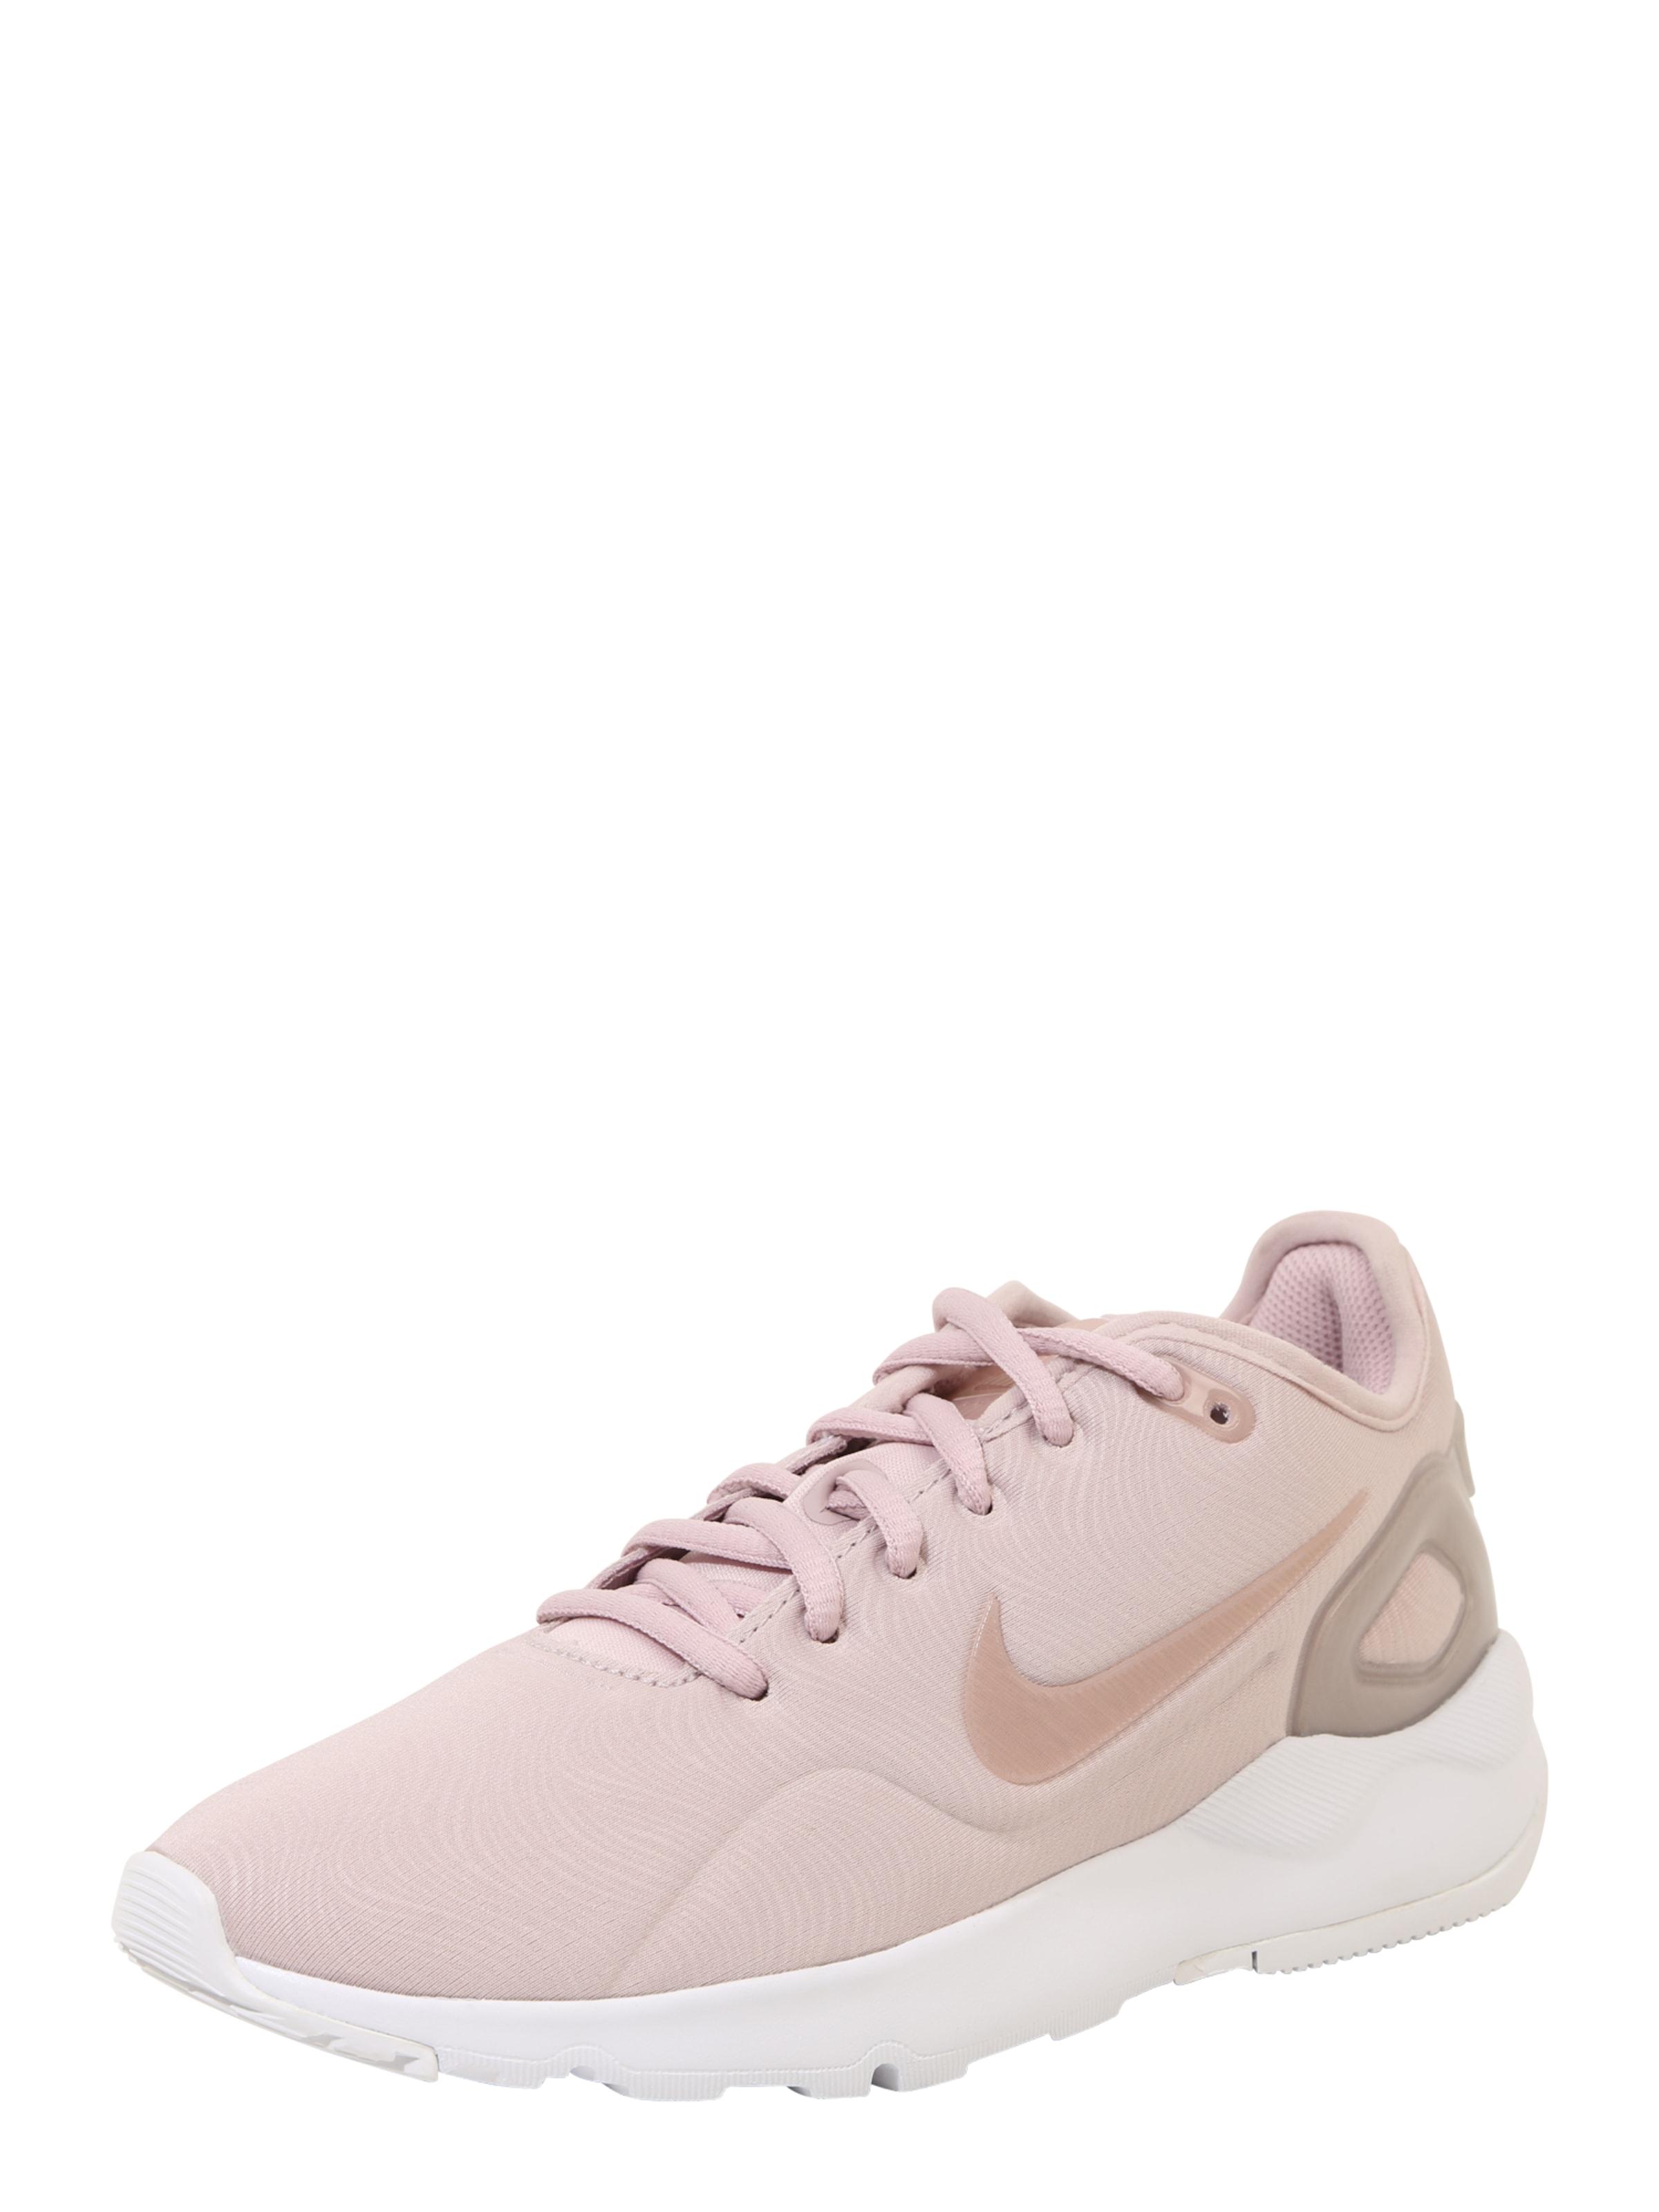 Nike Sportswear | TurnschuheLow  Lightweight Stargazer Lightweight  d1b4fa